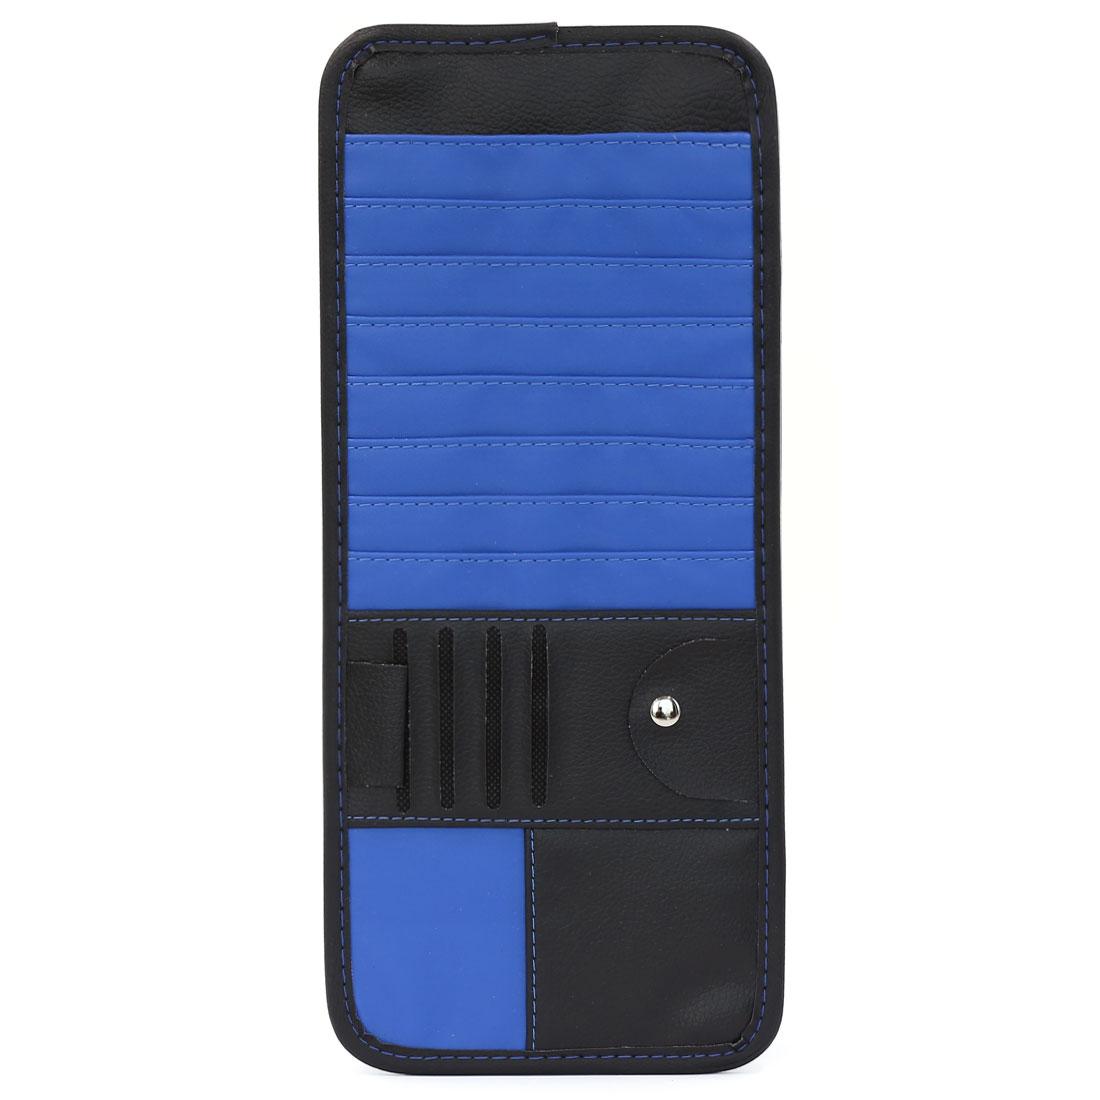 Faux Leather 14 Slots CD DVD Dics Visor Storage Organiser Holder Case Blue Black for Car